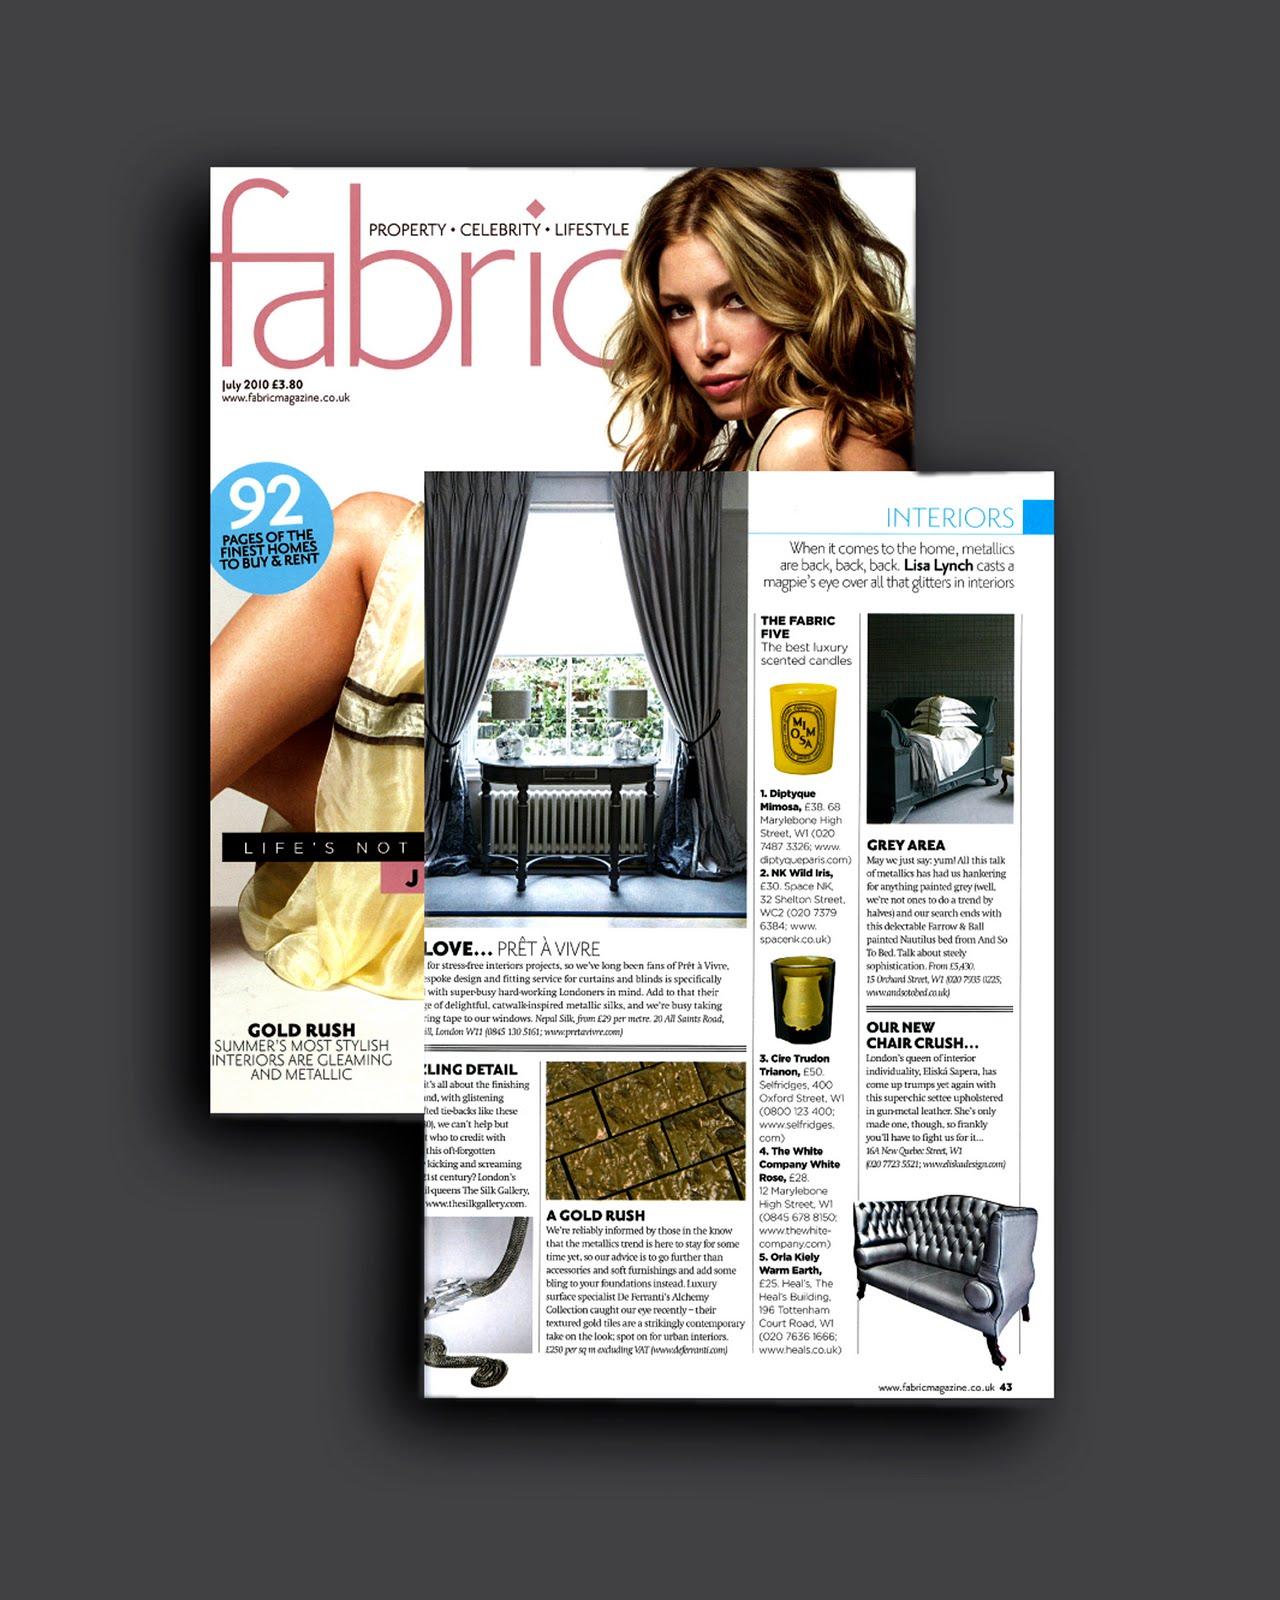 Fabric Magazine July 2010 Fabric Magazine July 2010